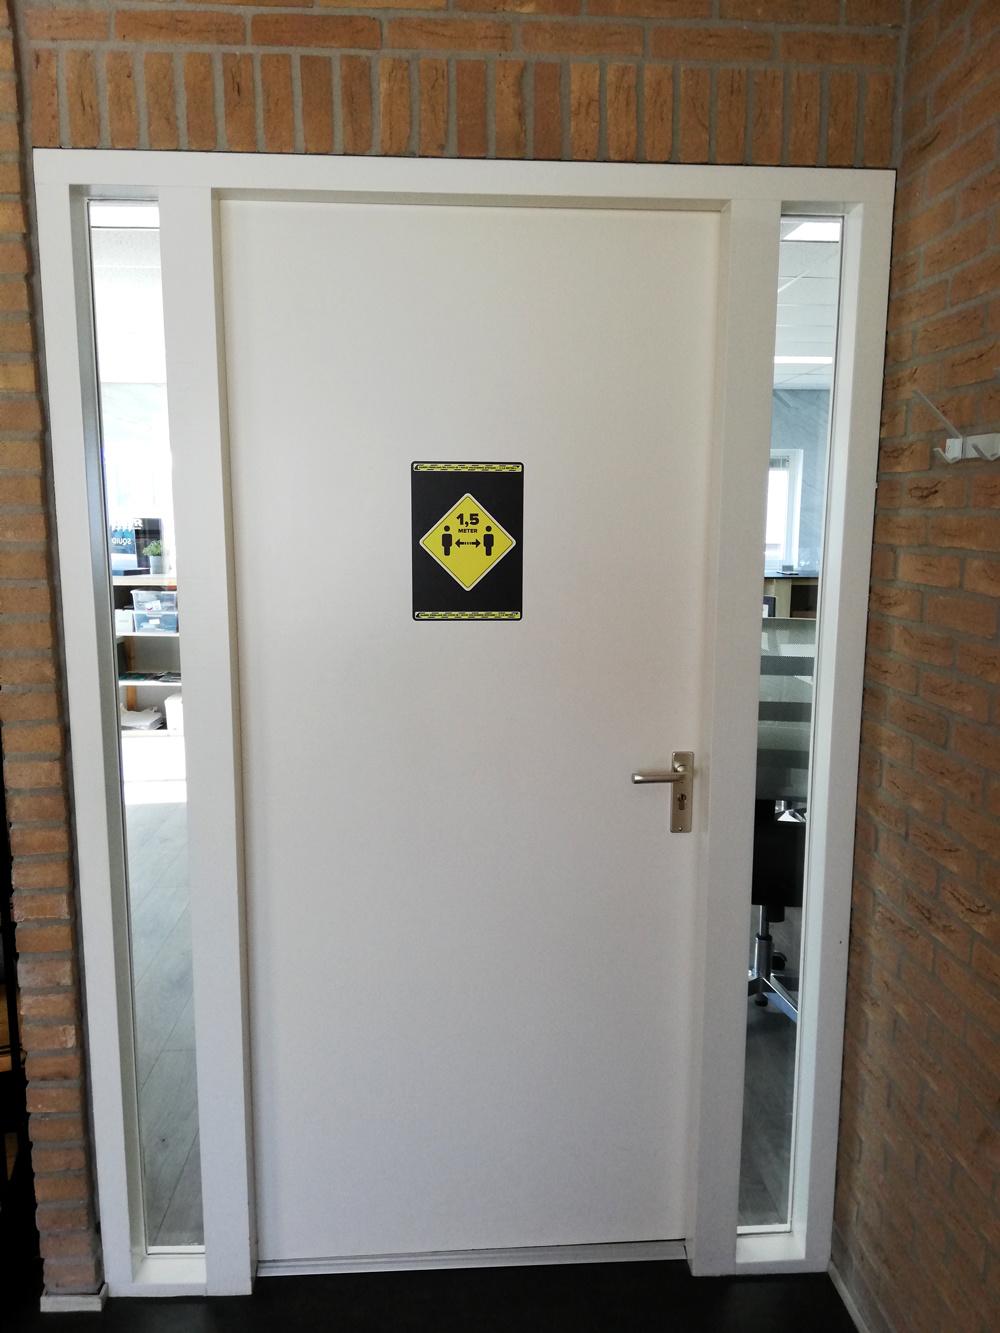 Easydot Wit Warning stickers: Keep away